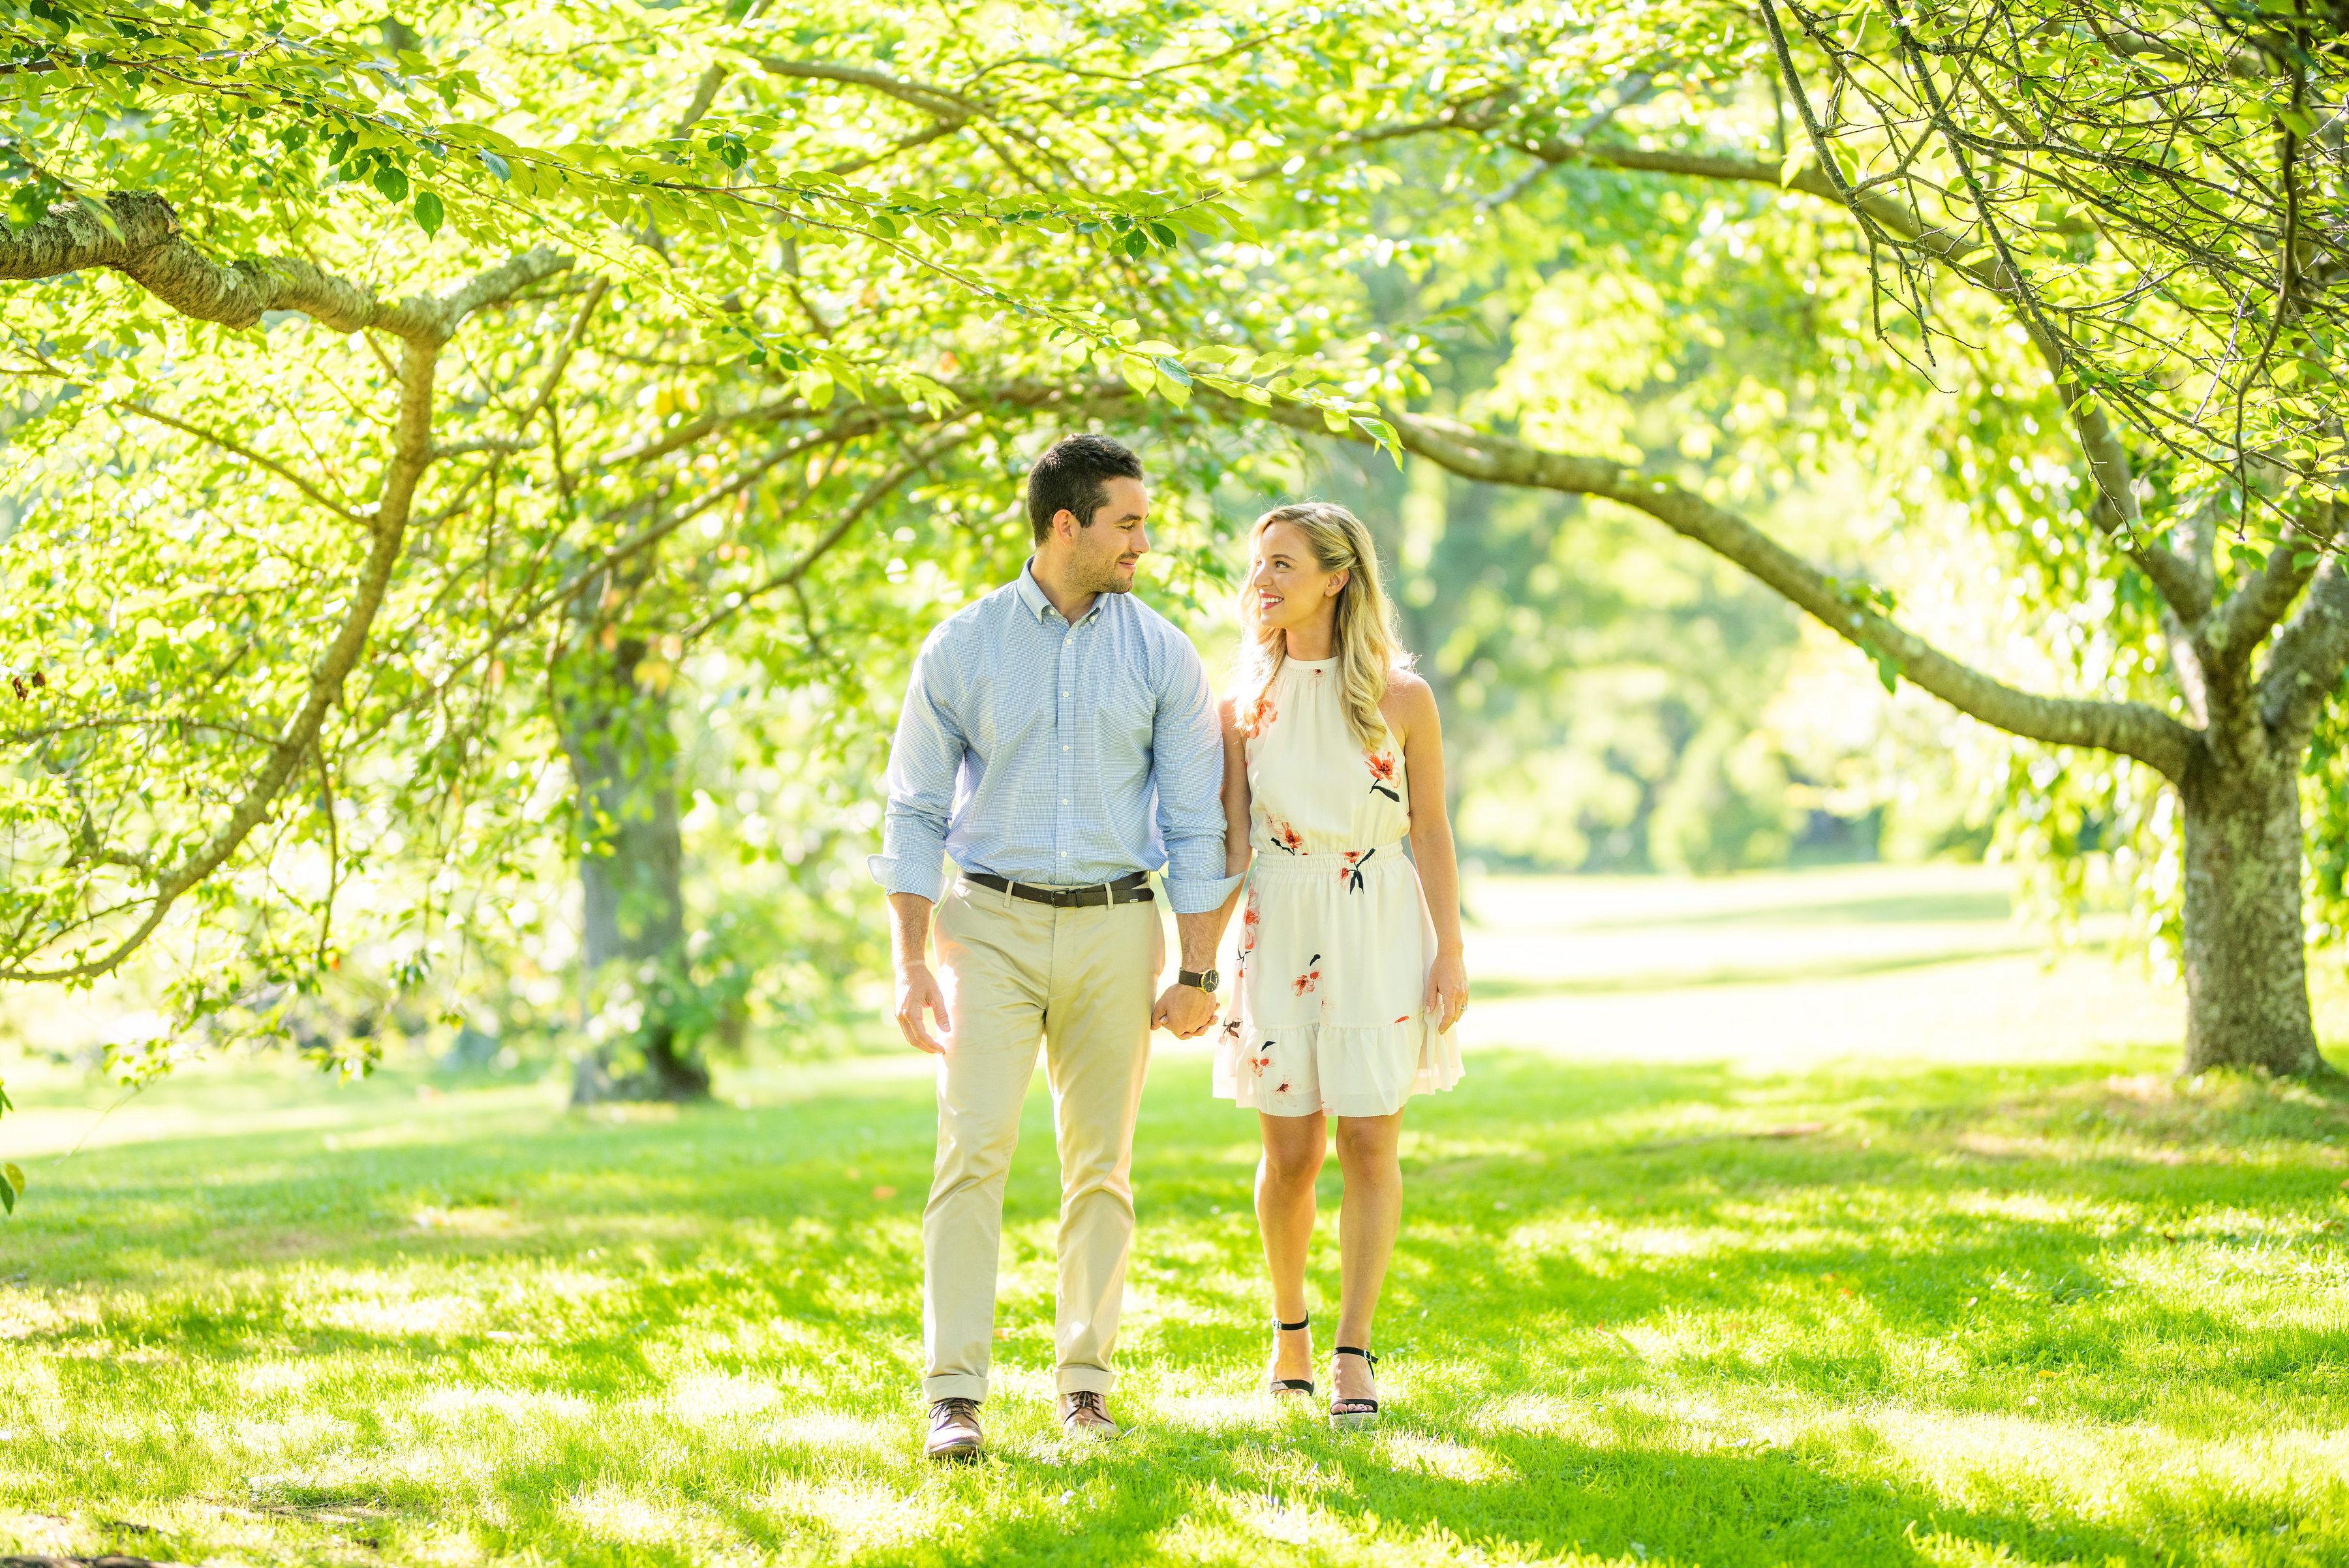 Planting Fields Arboretum Engagement Shoot | Oyster Bay Engagement Shoot | Long Island Wedding Photographer19